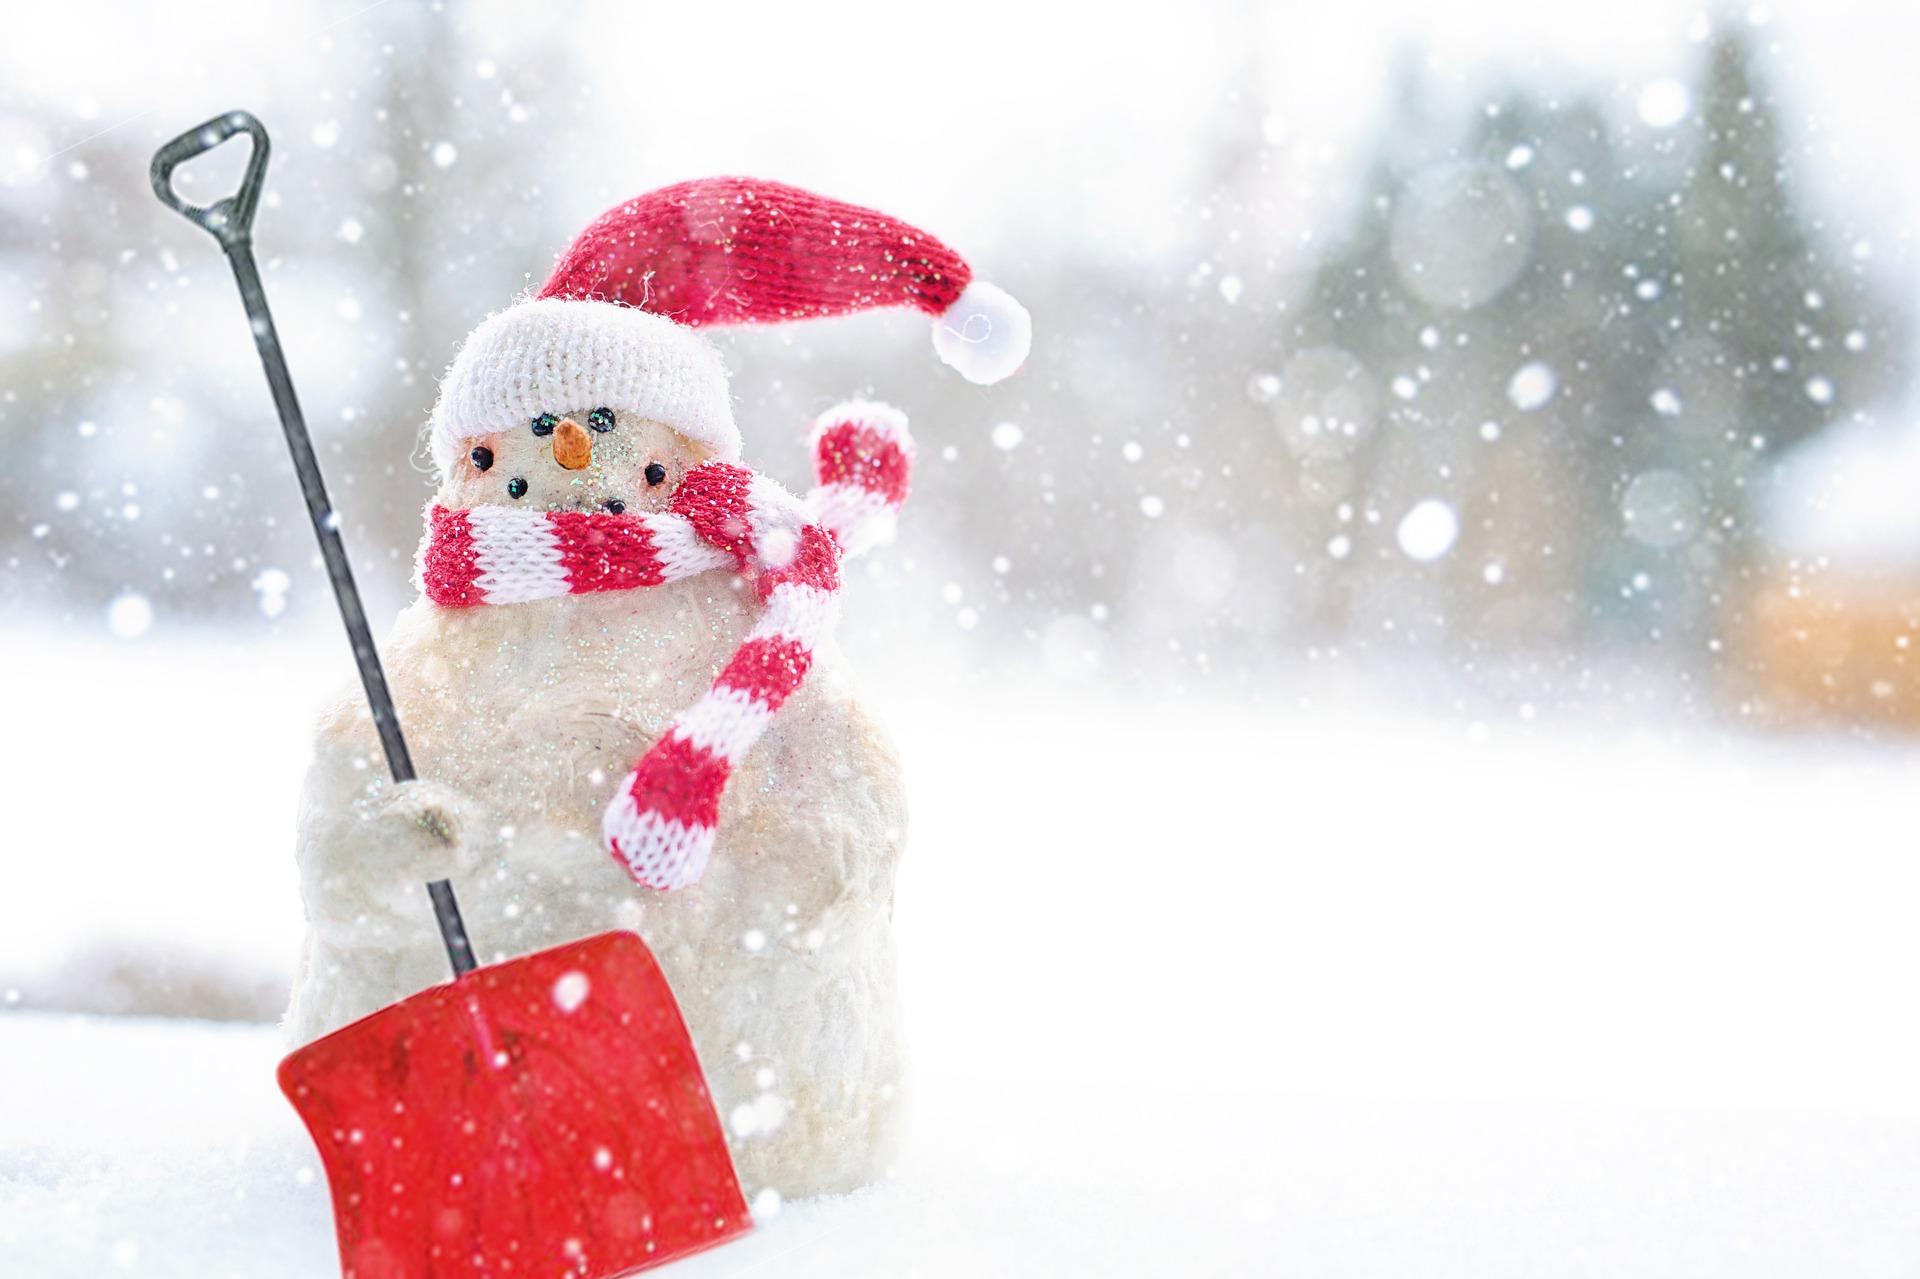 OBRÁZEK : winter-3084963_1920.jpg